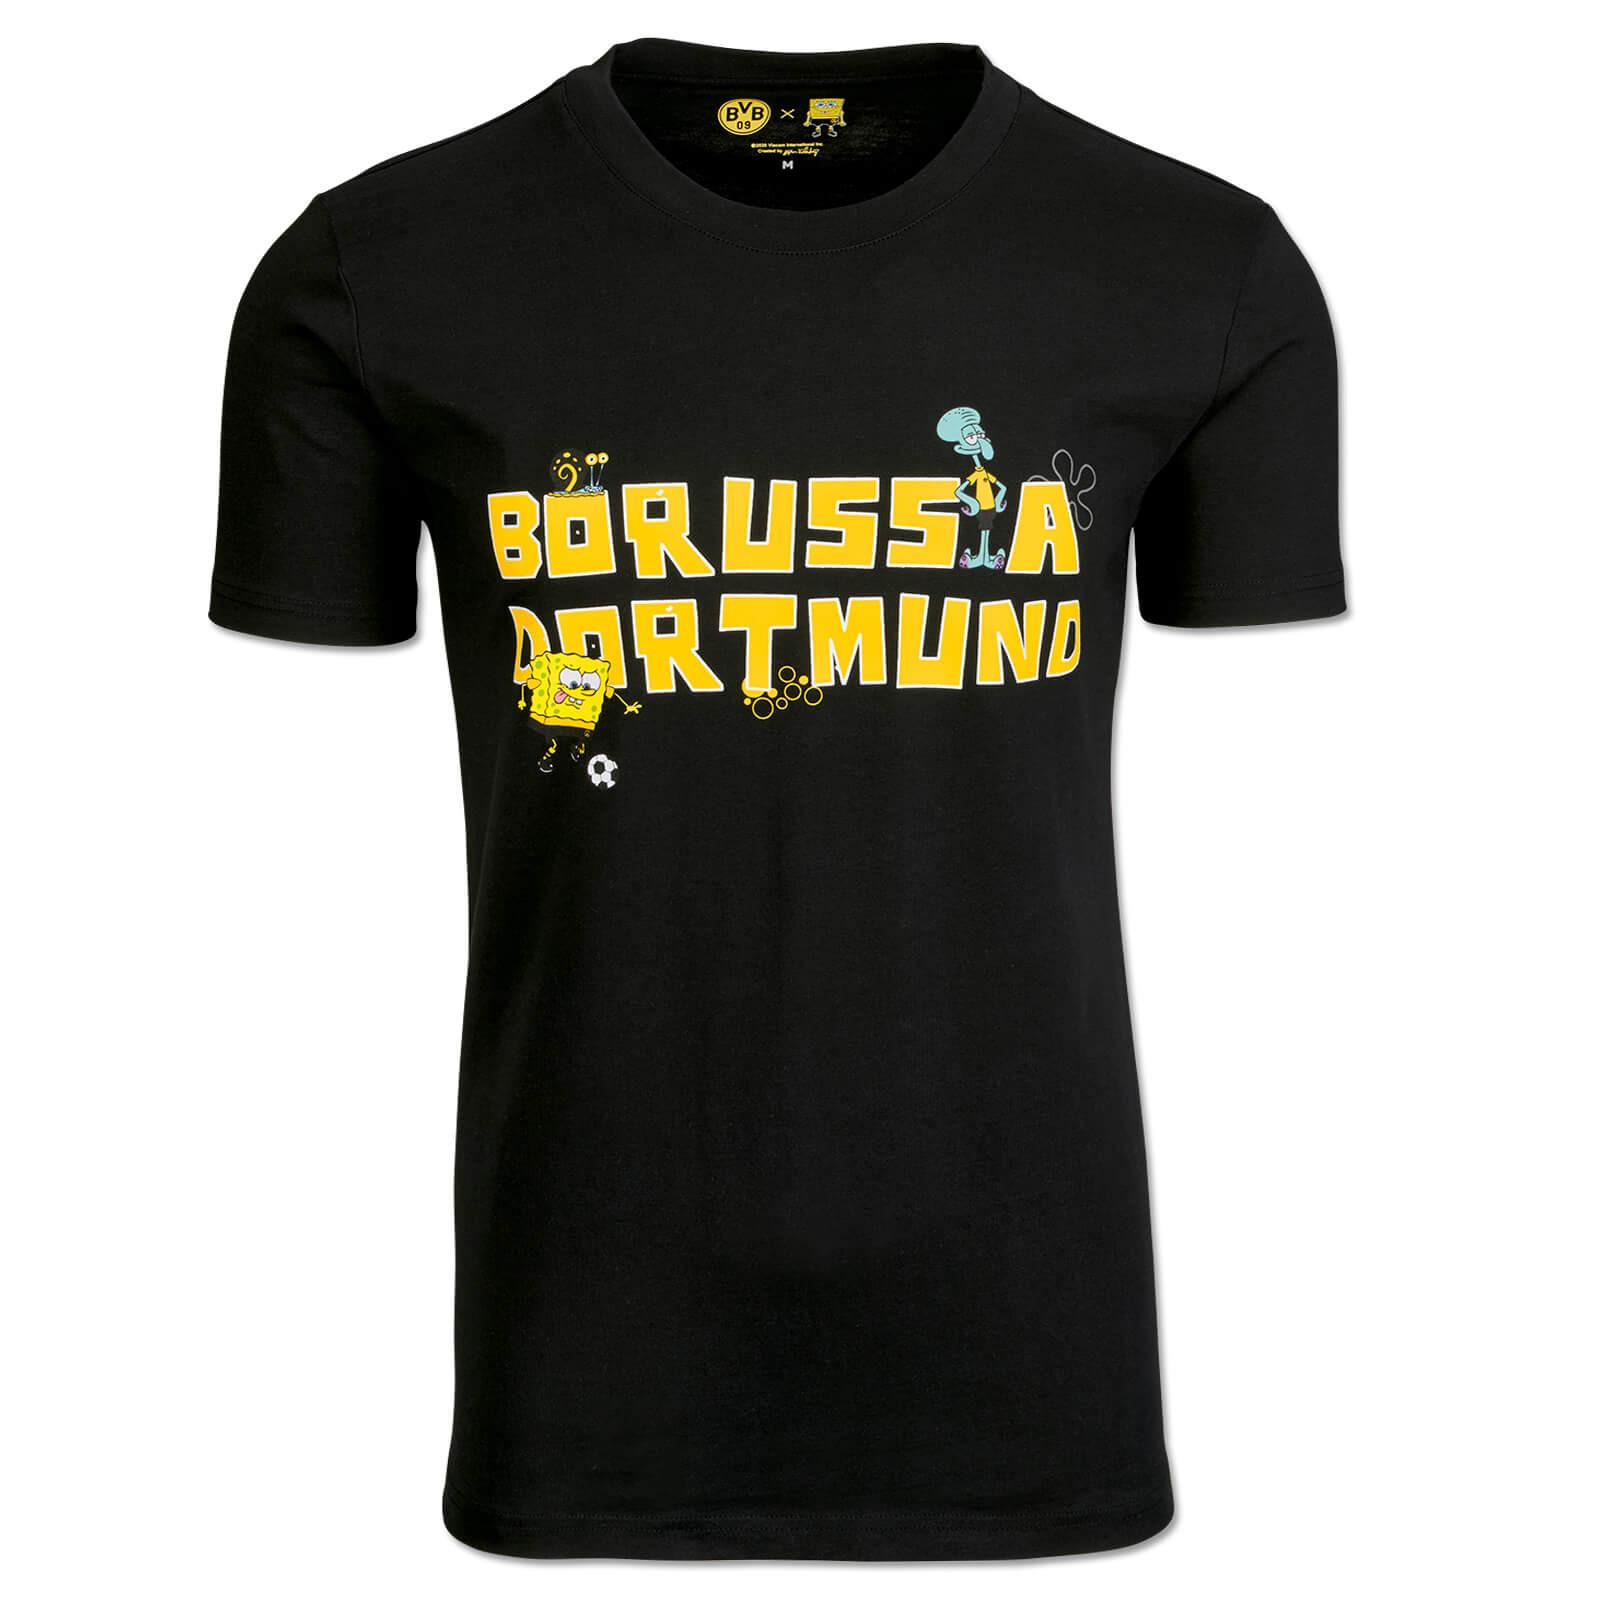 SpongeBob x Borussia Dortmund T-shirt black